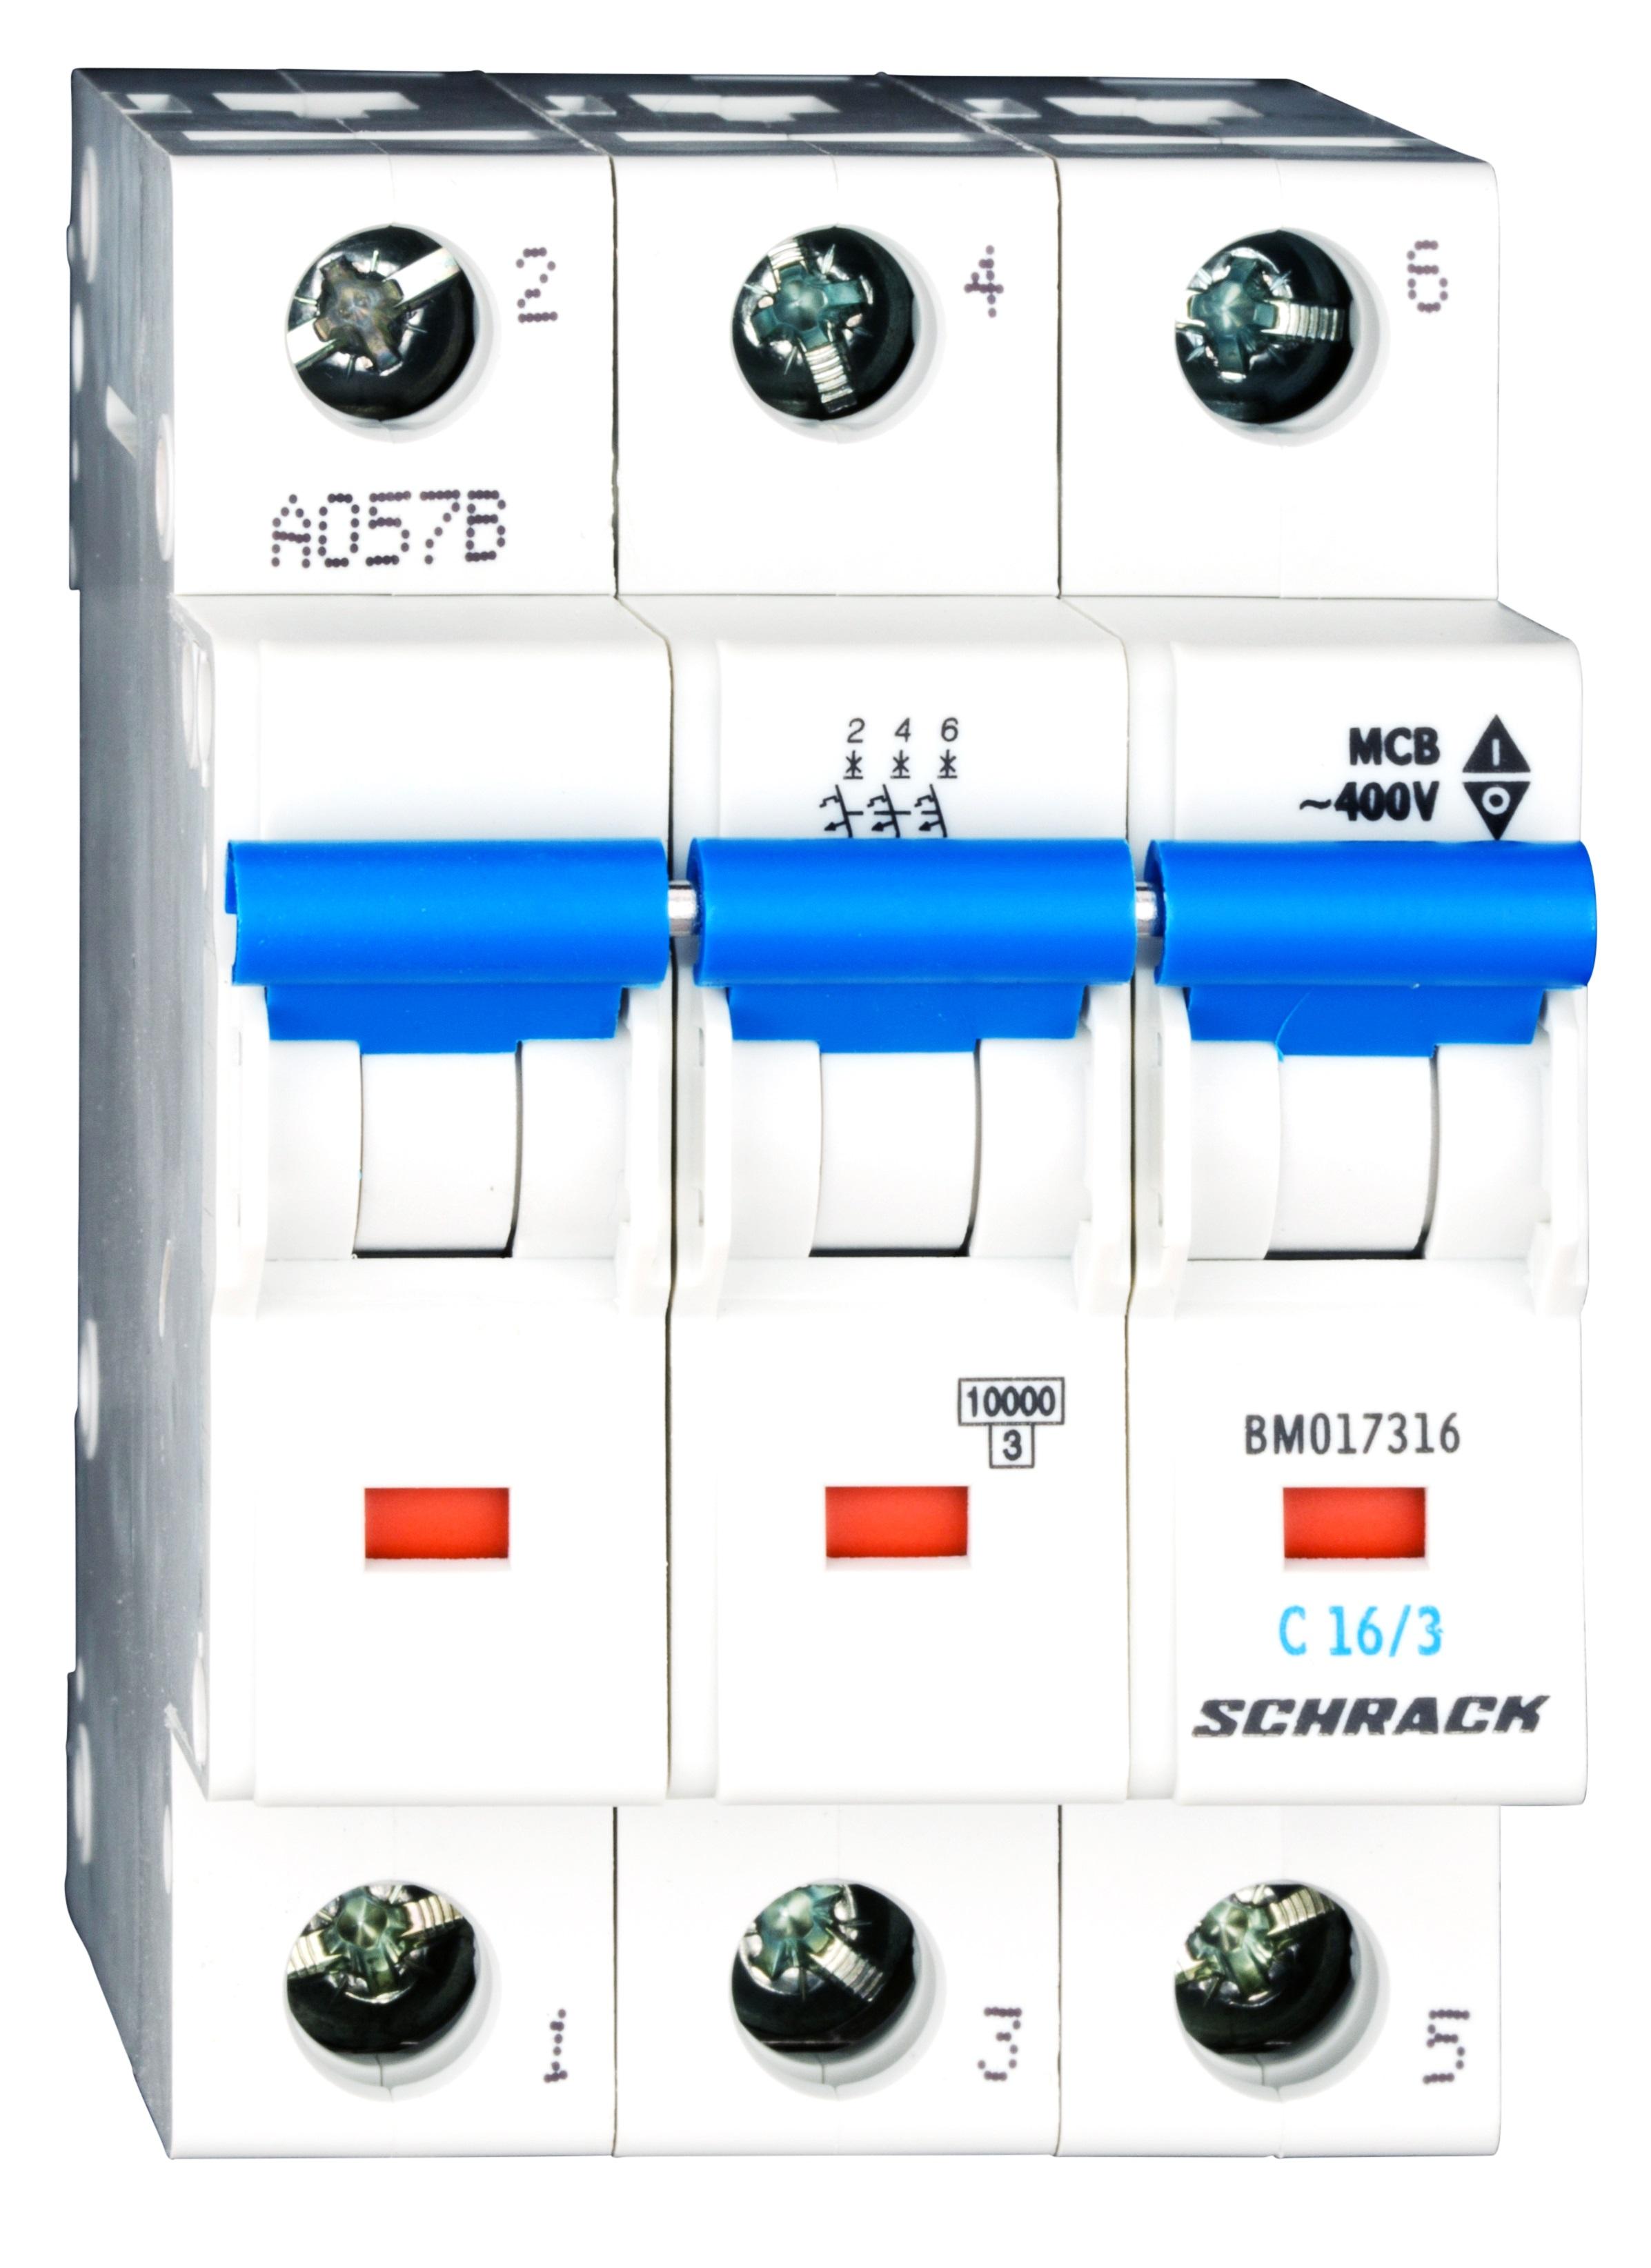 1 Stk Sicherungsautomat, Kennlinie C, 16A, 3-polig, 10kA BM017316--